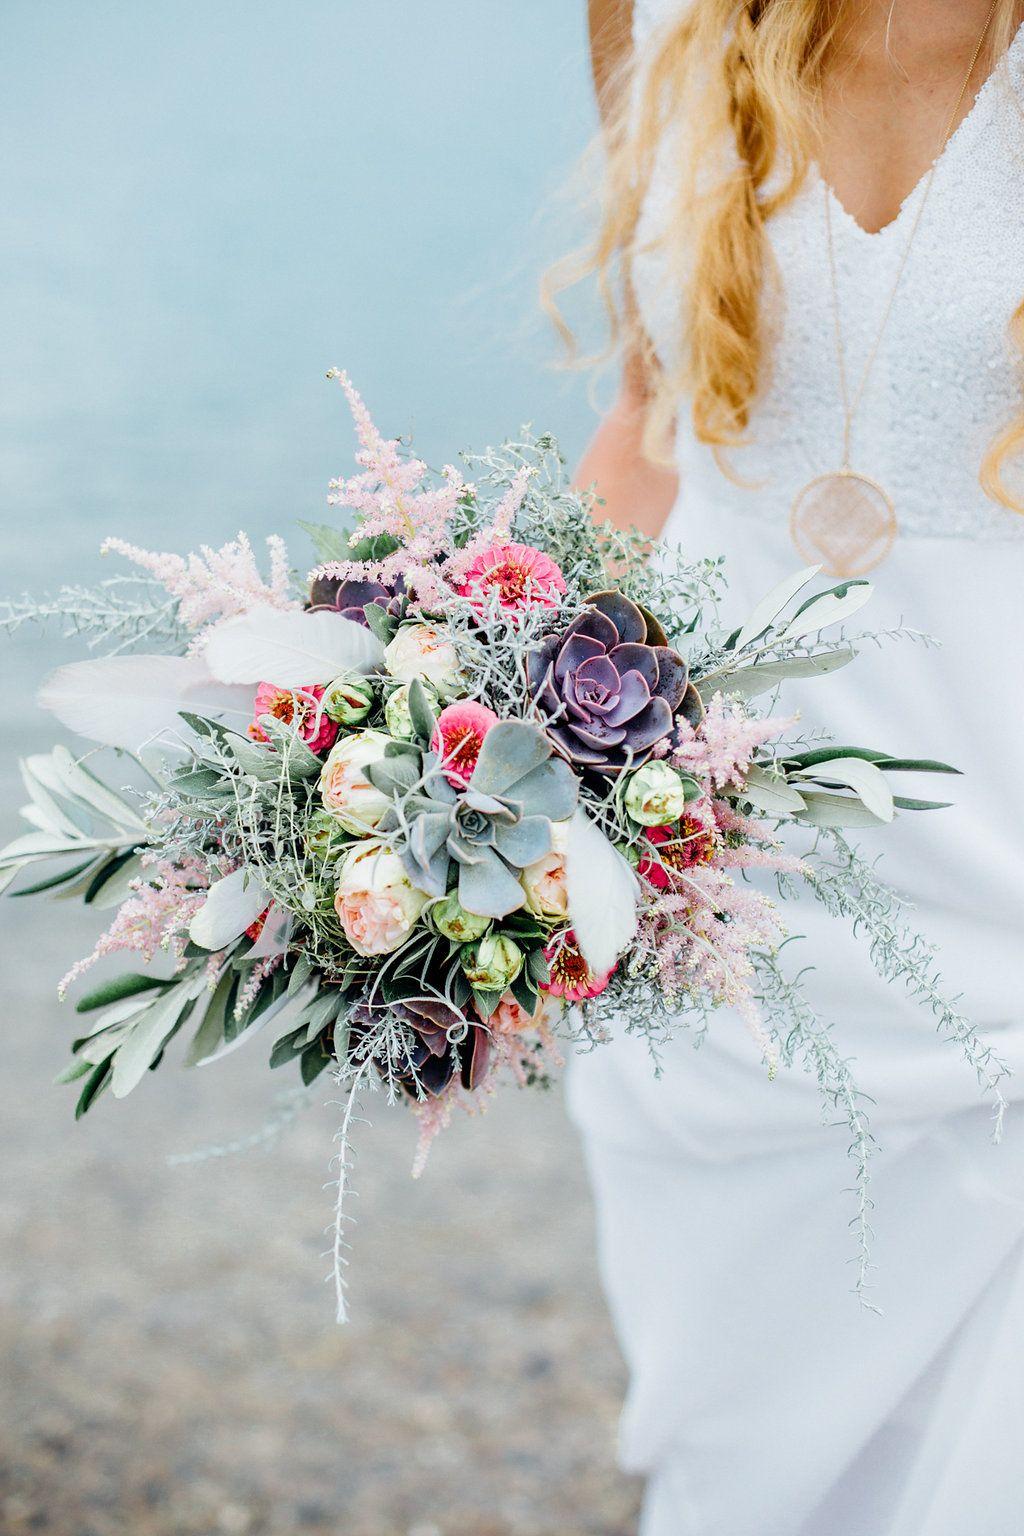 Diy Bouquet Wedding How To Make